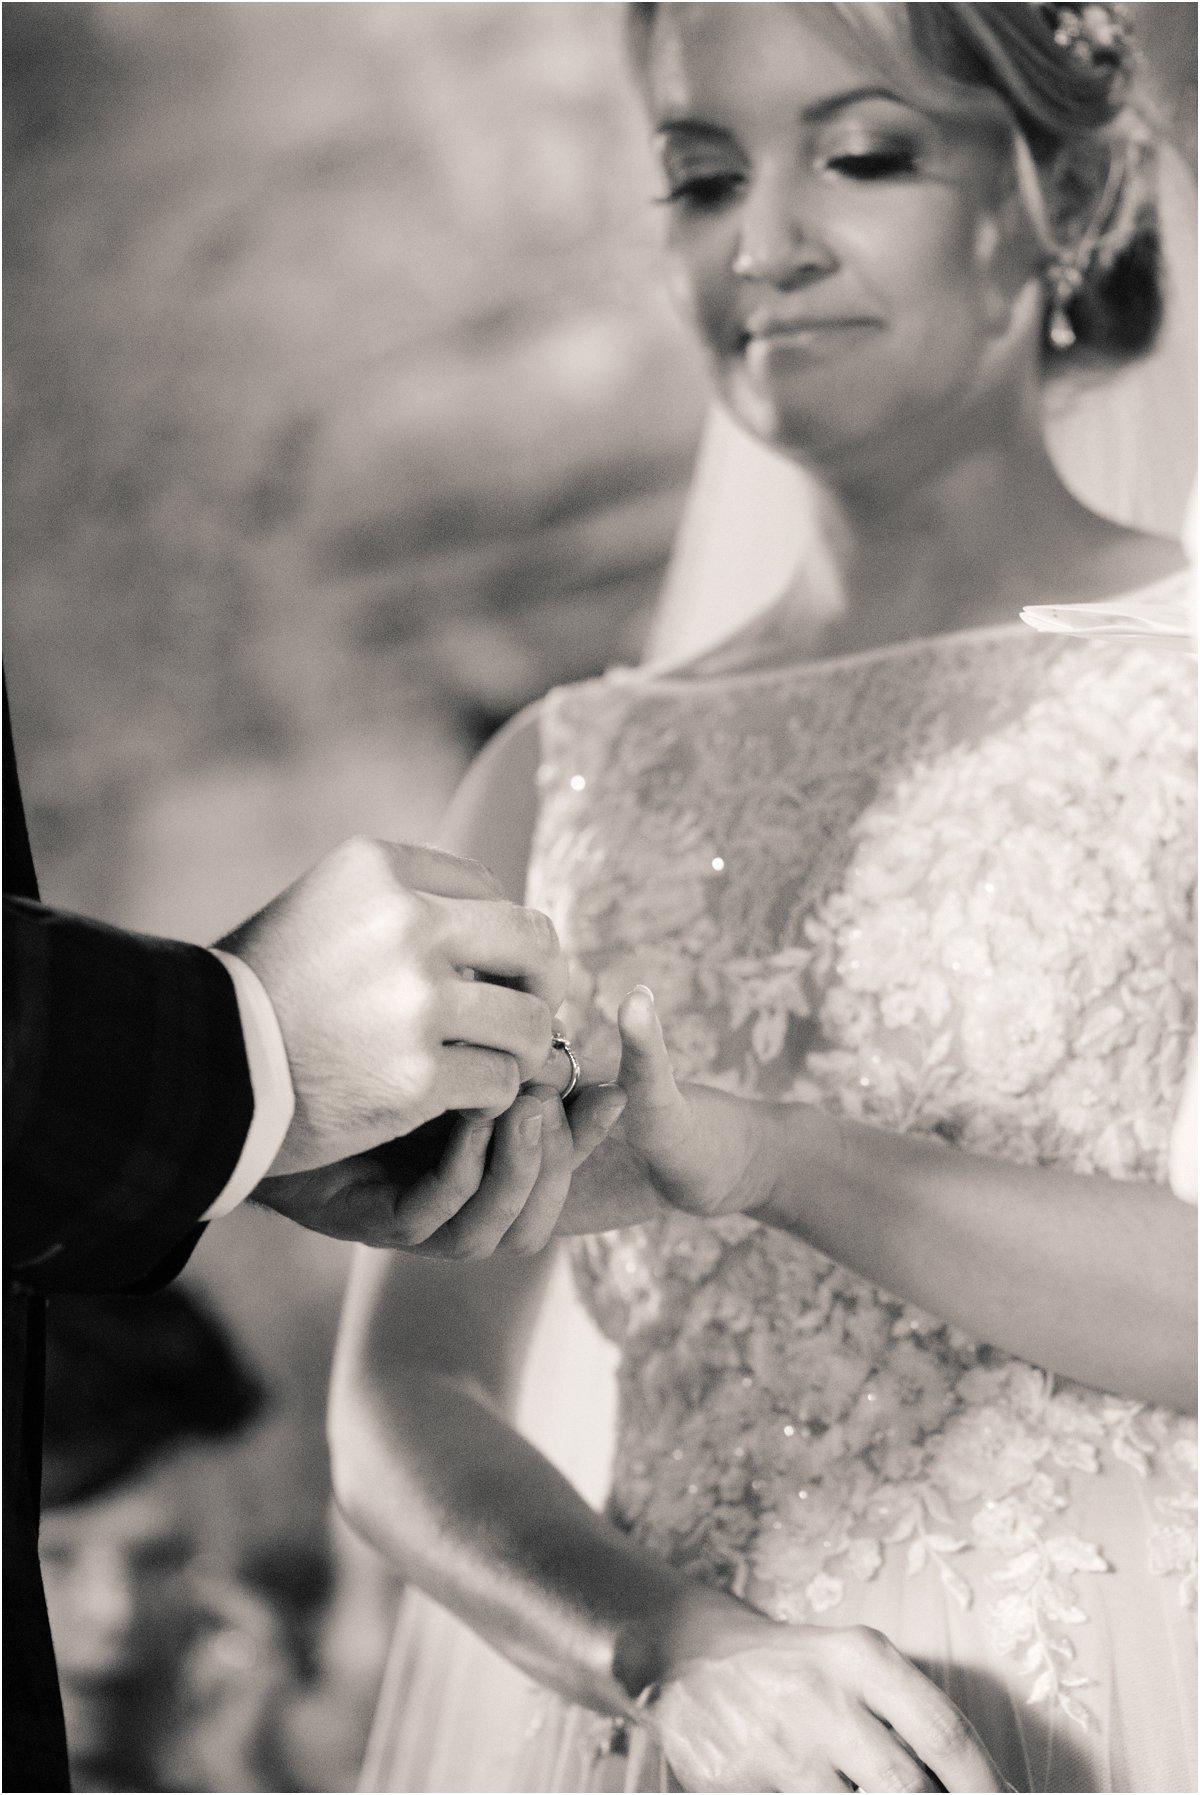 Crofts&Kowalczyk_DundasCastle_WeddingPhotography_Hannah&Tom-43.jpg